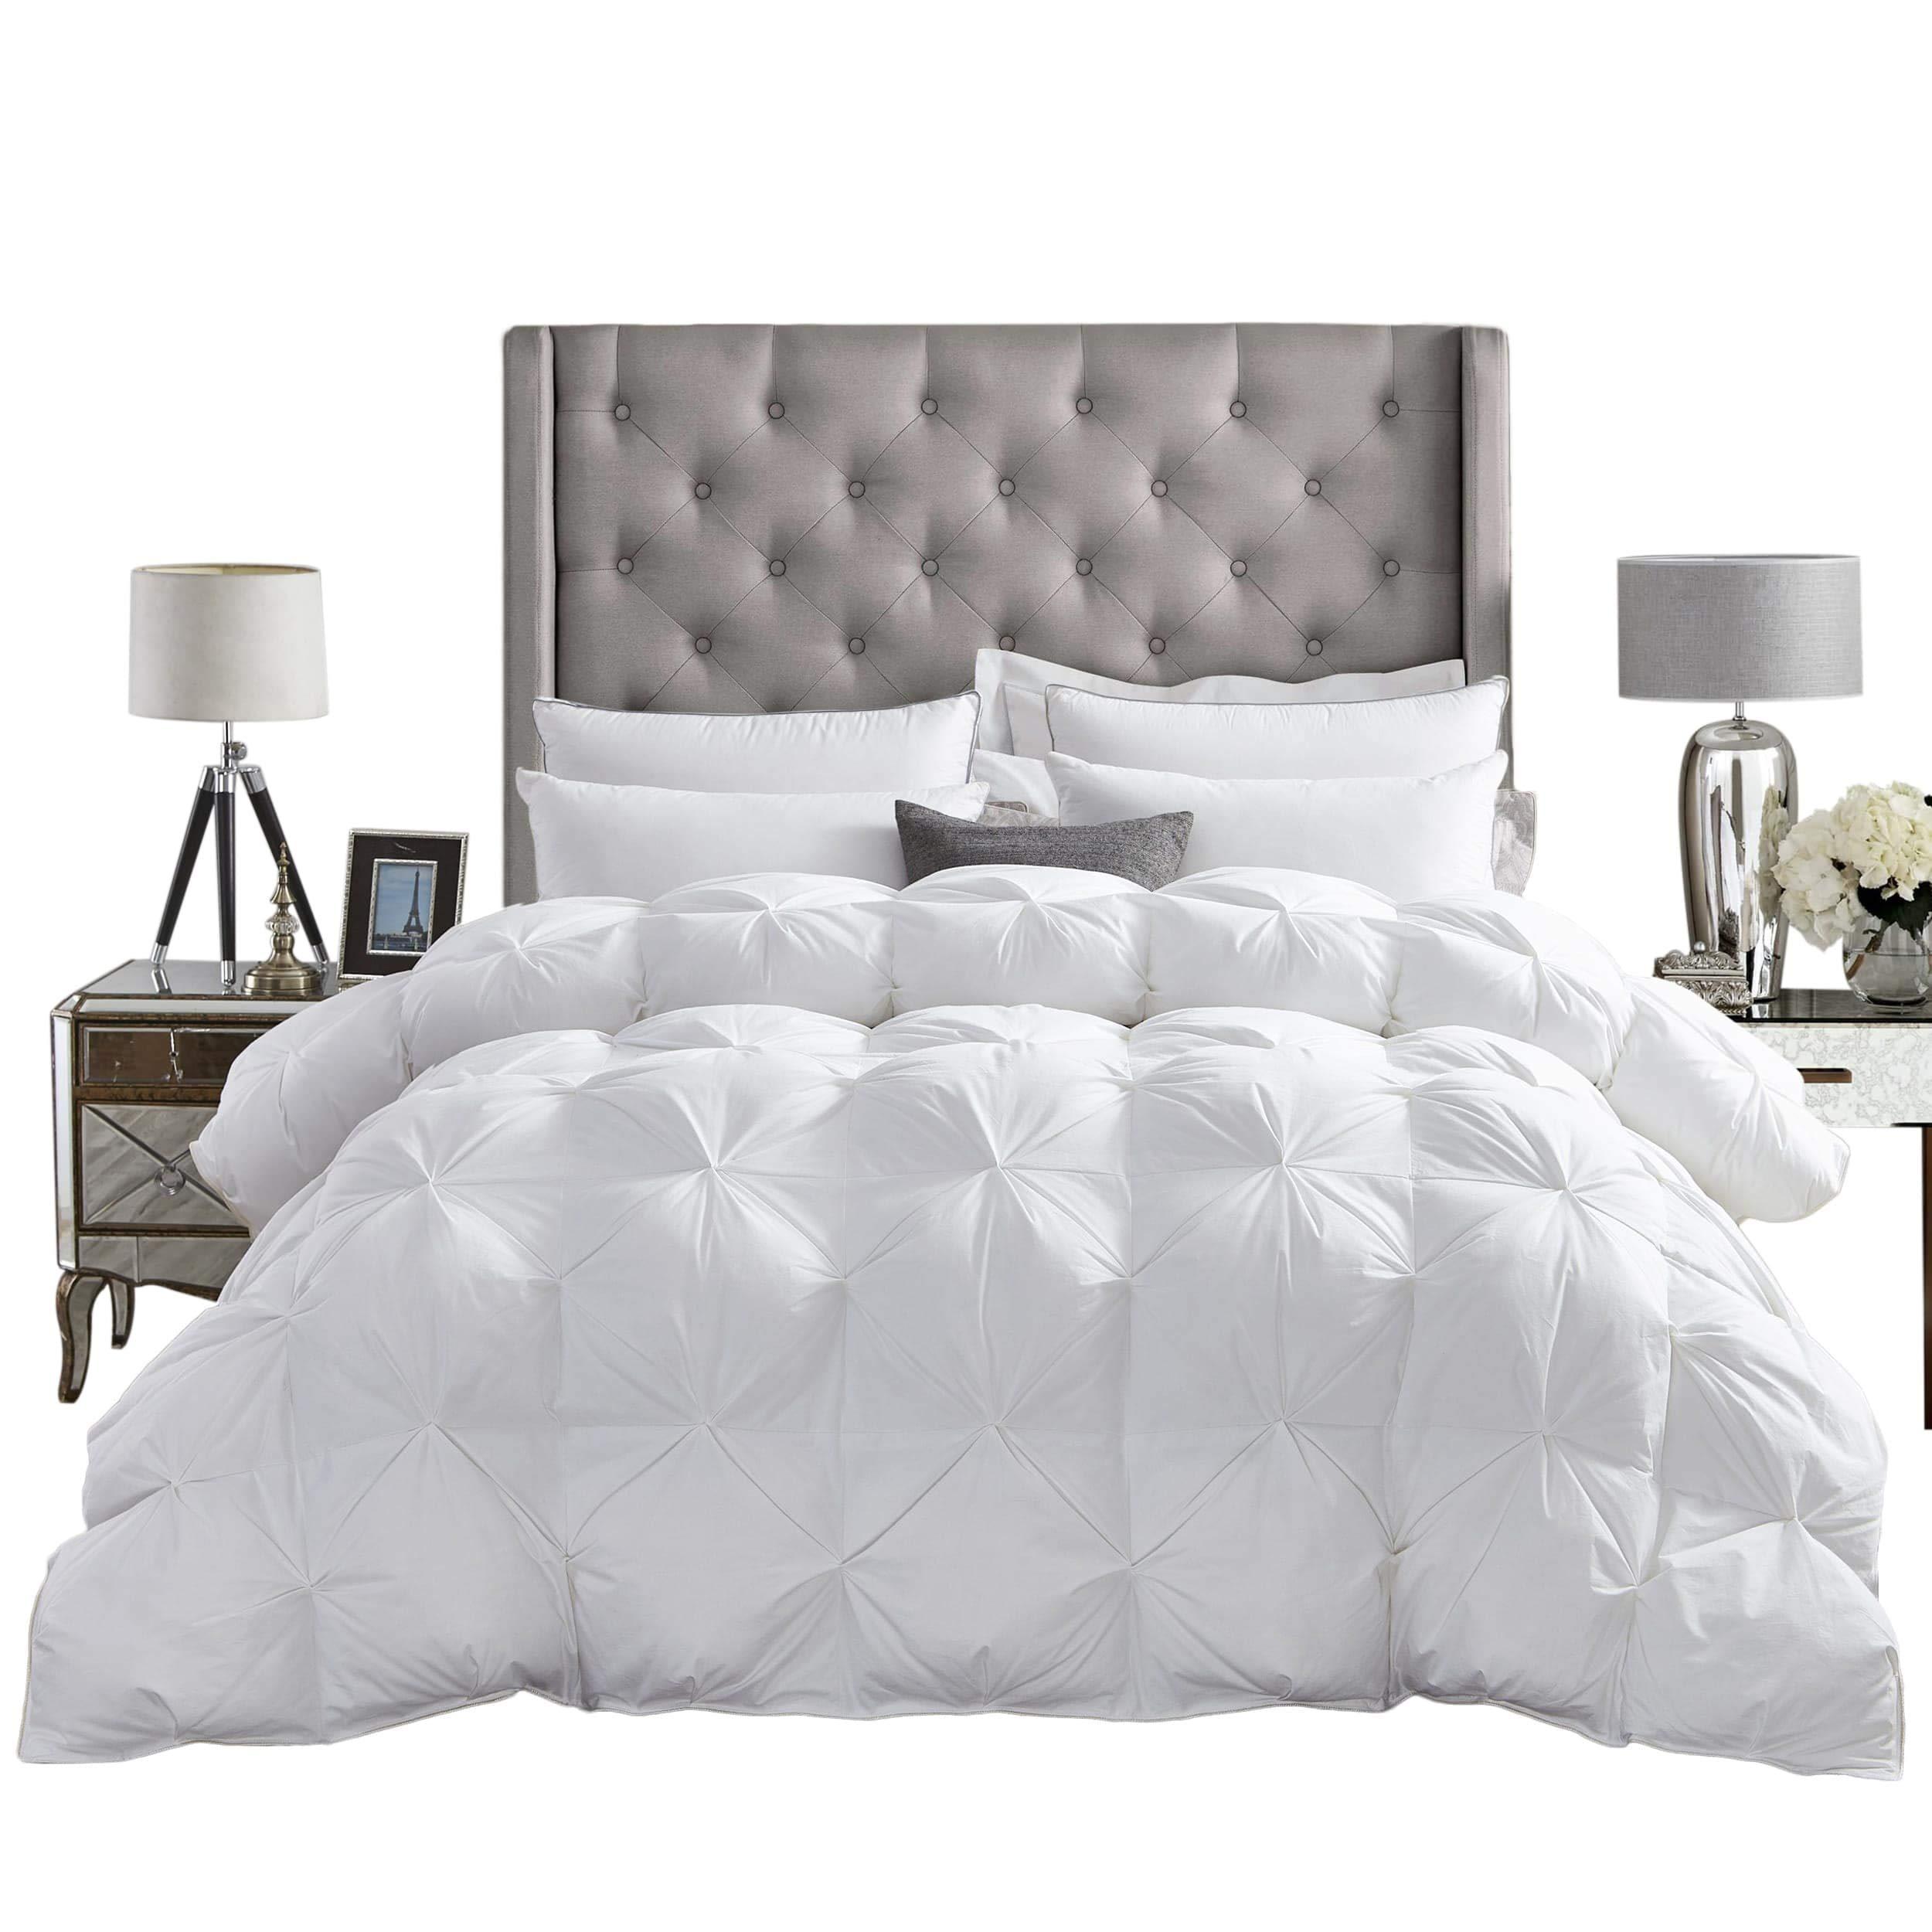 LUXURIOUS All-Season Goose Down Comforter King Size Duvet Insert, Exquisite PINCH PLEAT Design, Premium Baffle Box, 1200 Thread Count 100% Egyptian Cotton, 750+ Fill Power, 65 oz Fill Weight, White